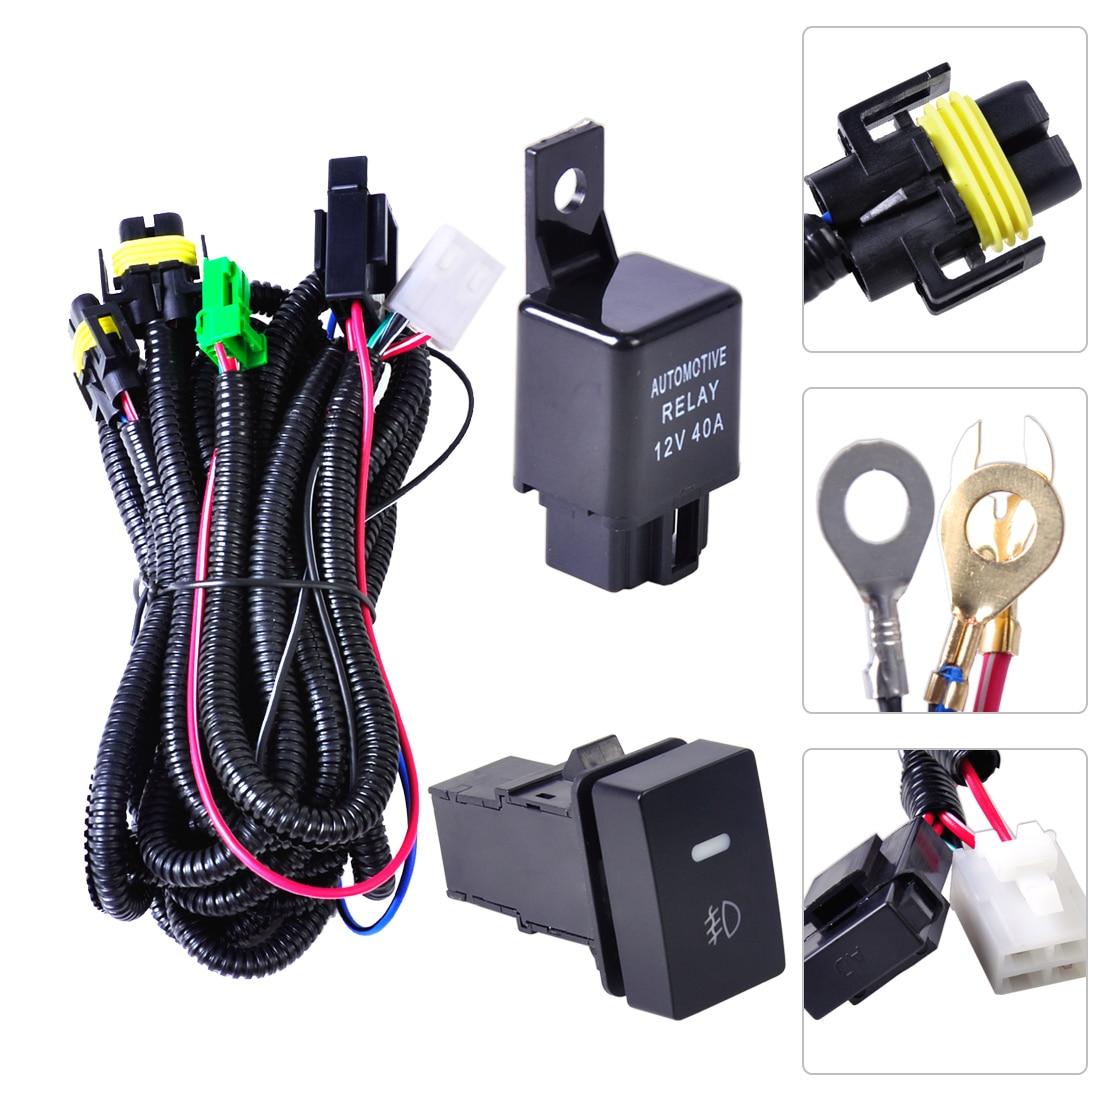 Dwcx Wiring Harness Sockets Wire Switch For H11 Fog Light Lamp For Ford Focus Acura Nissan Suzuki Subaru Lincoln Honda Cr V Honda Honda Ford Light Switchfog Lamp Wiring Aliexpress